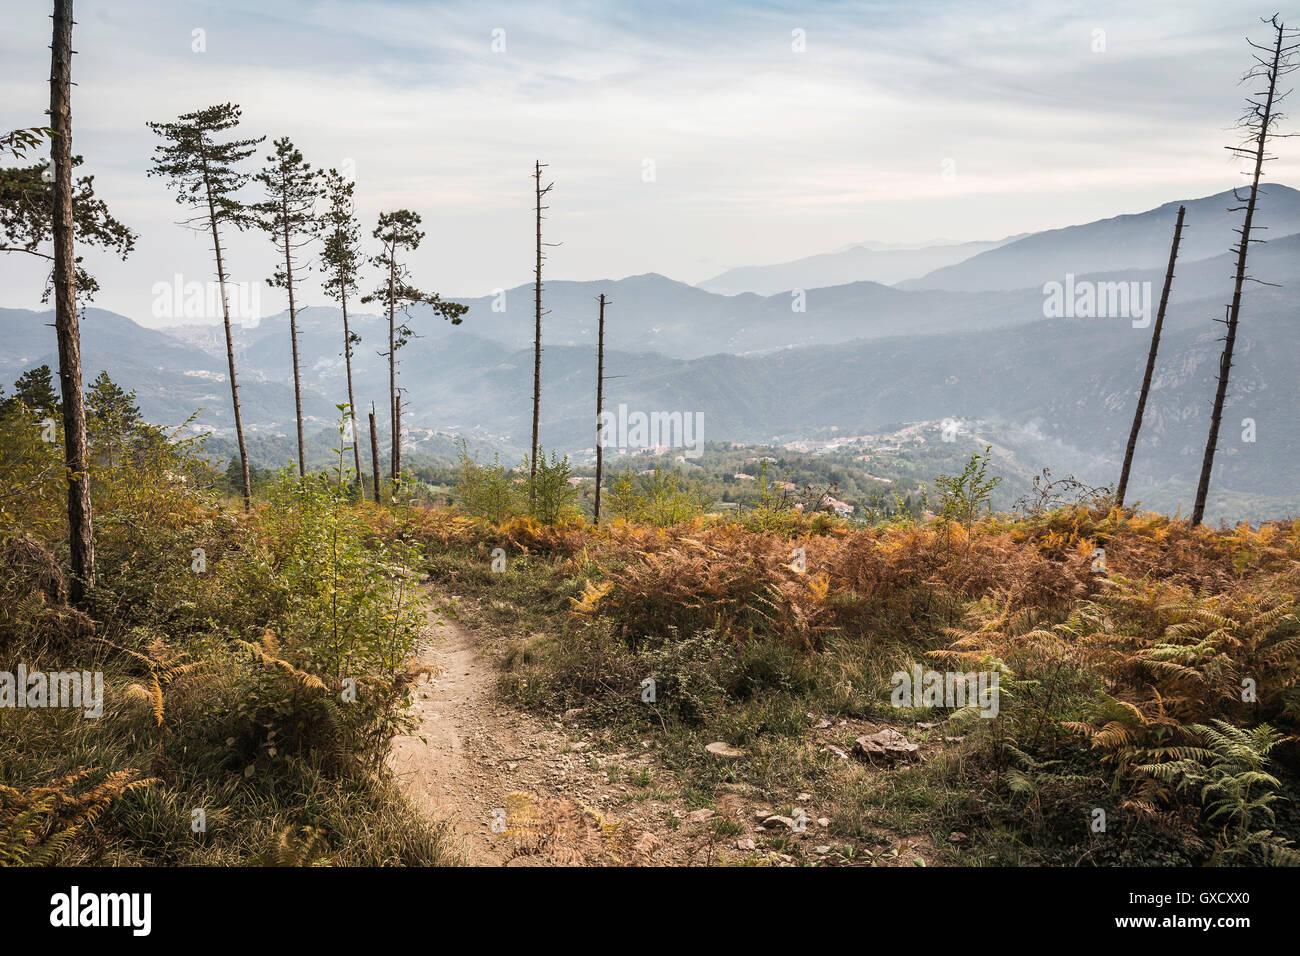 Elevated view of mountain range, Finale Ligure, Savona, Italy - Stock Image